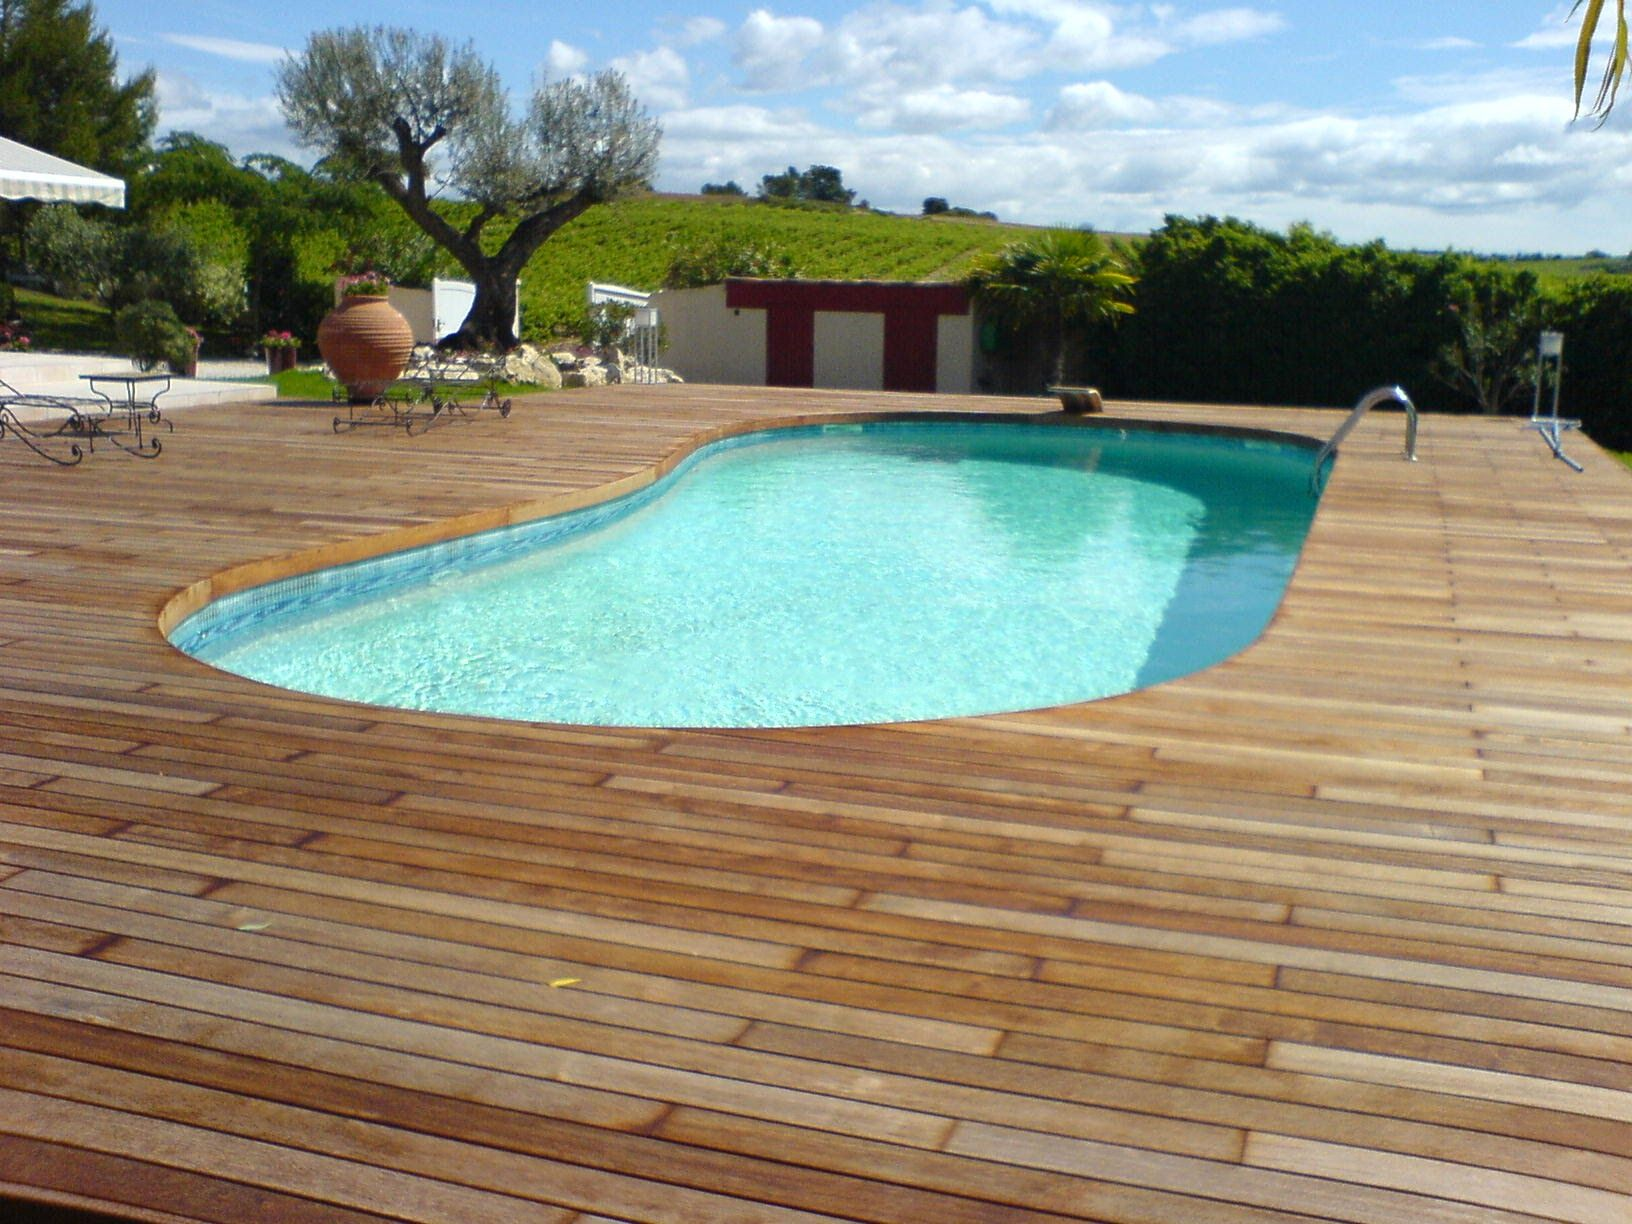 terrasse de piscine en merbau visserie cach e avec margelle int gr e terrasse merbau pinterest. Black Bedroom Furniture Sets. Home Design Ideas